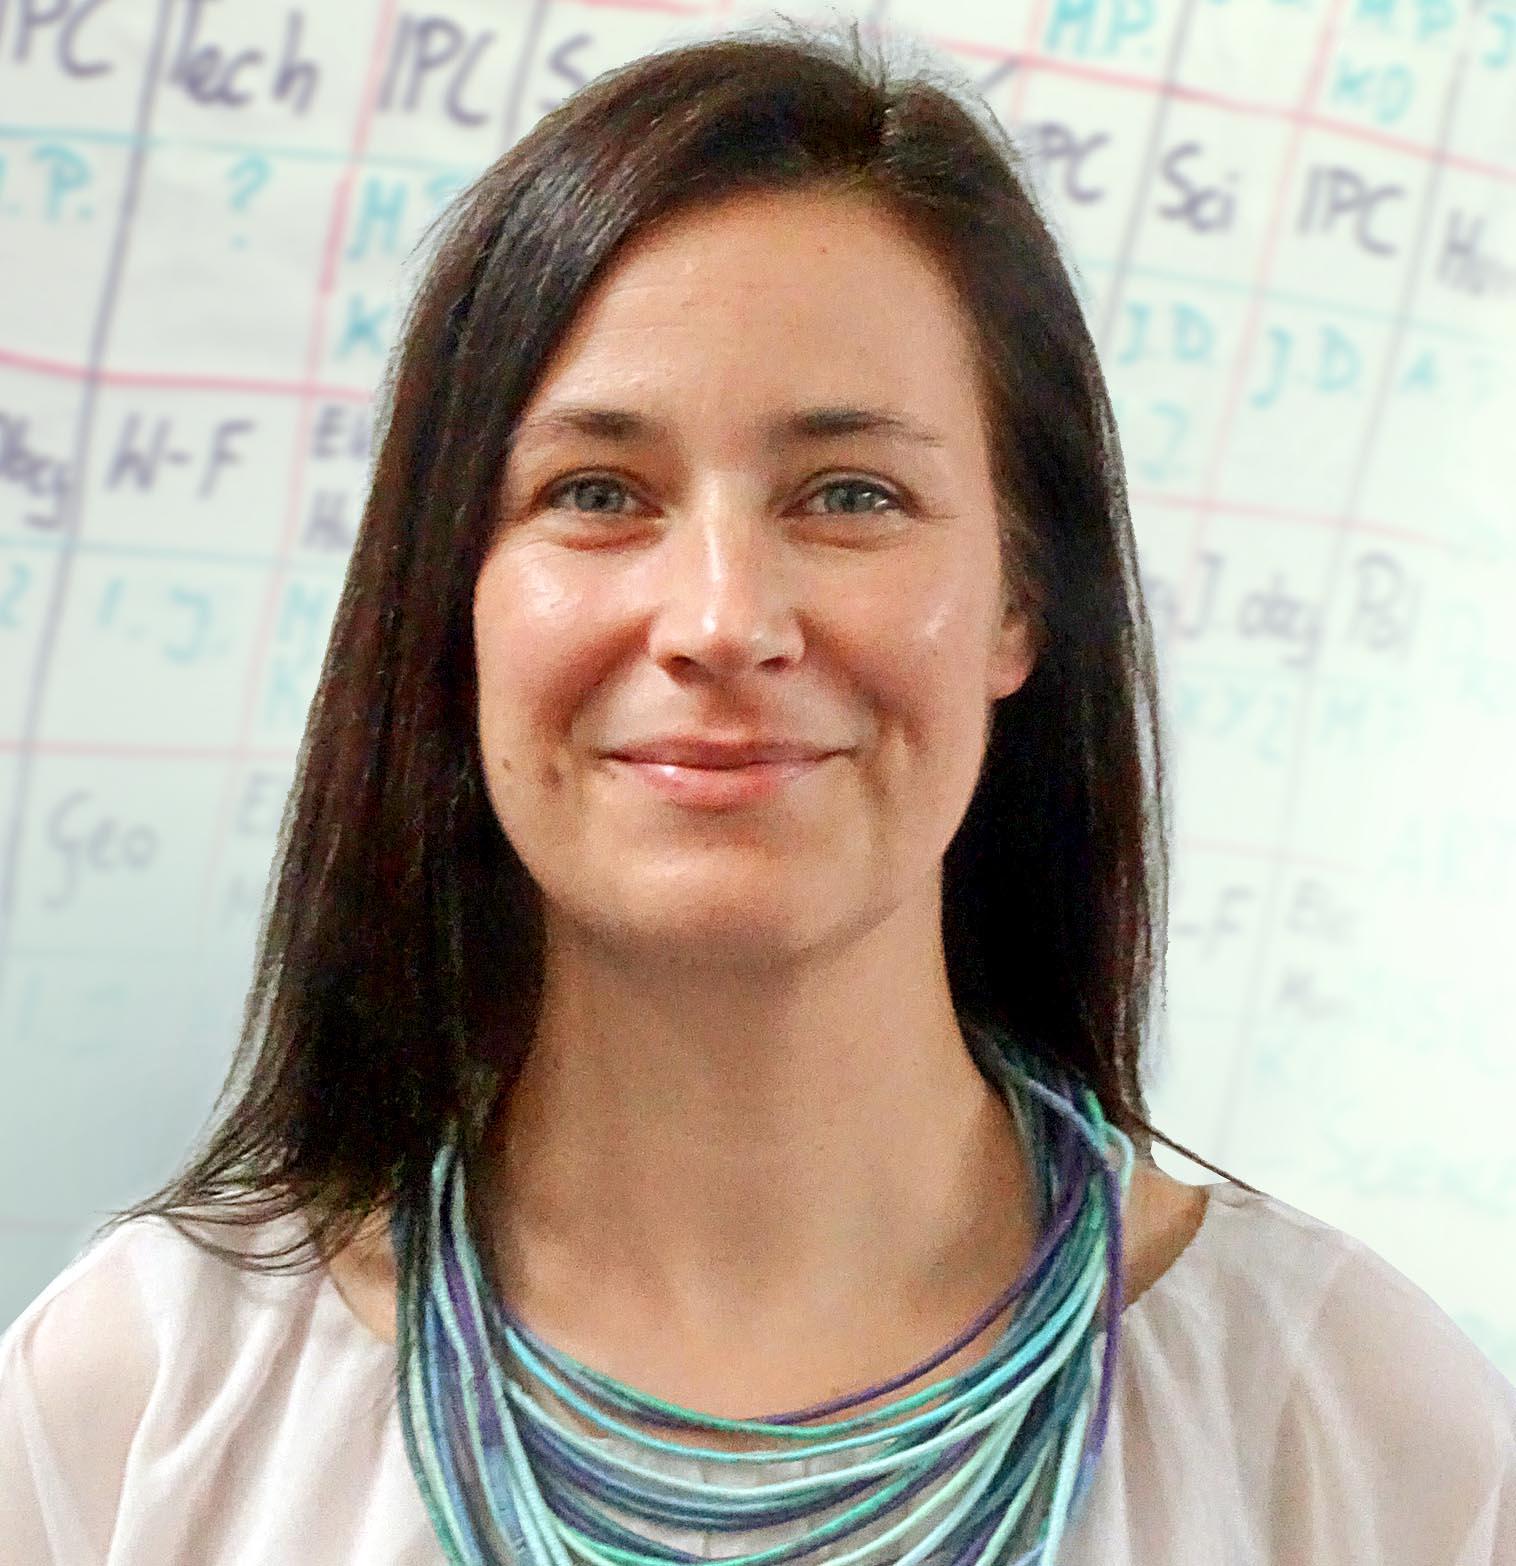 Monika Gendek